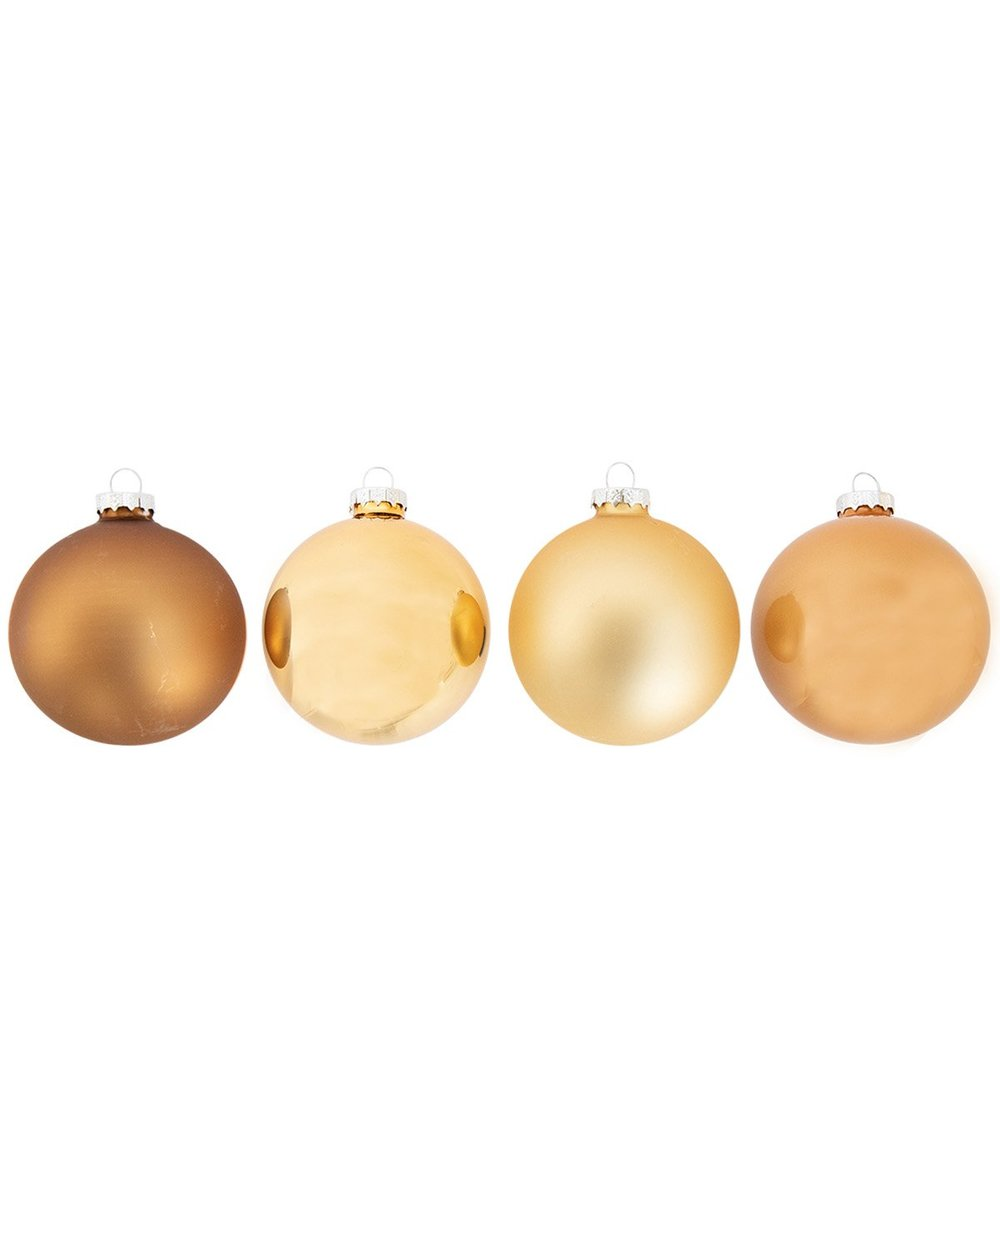 Shades_of_Gold_Ornaments_1.jpg